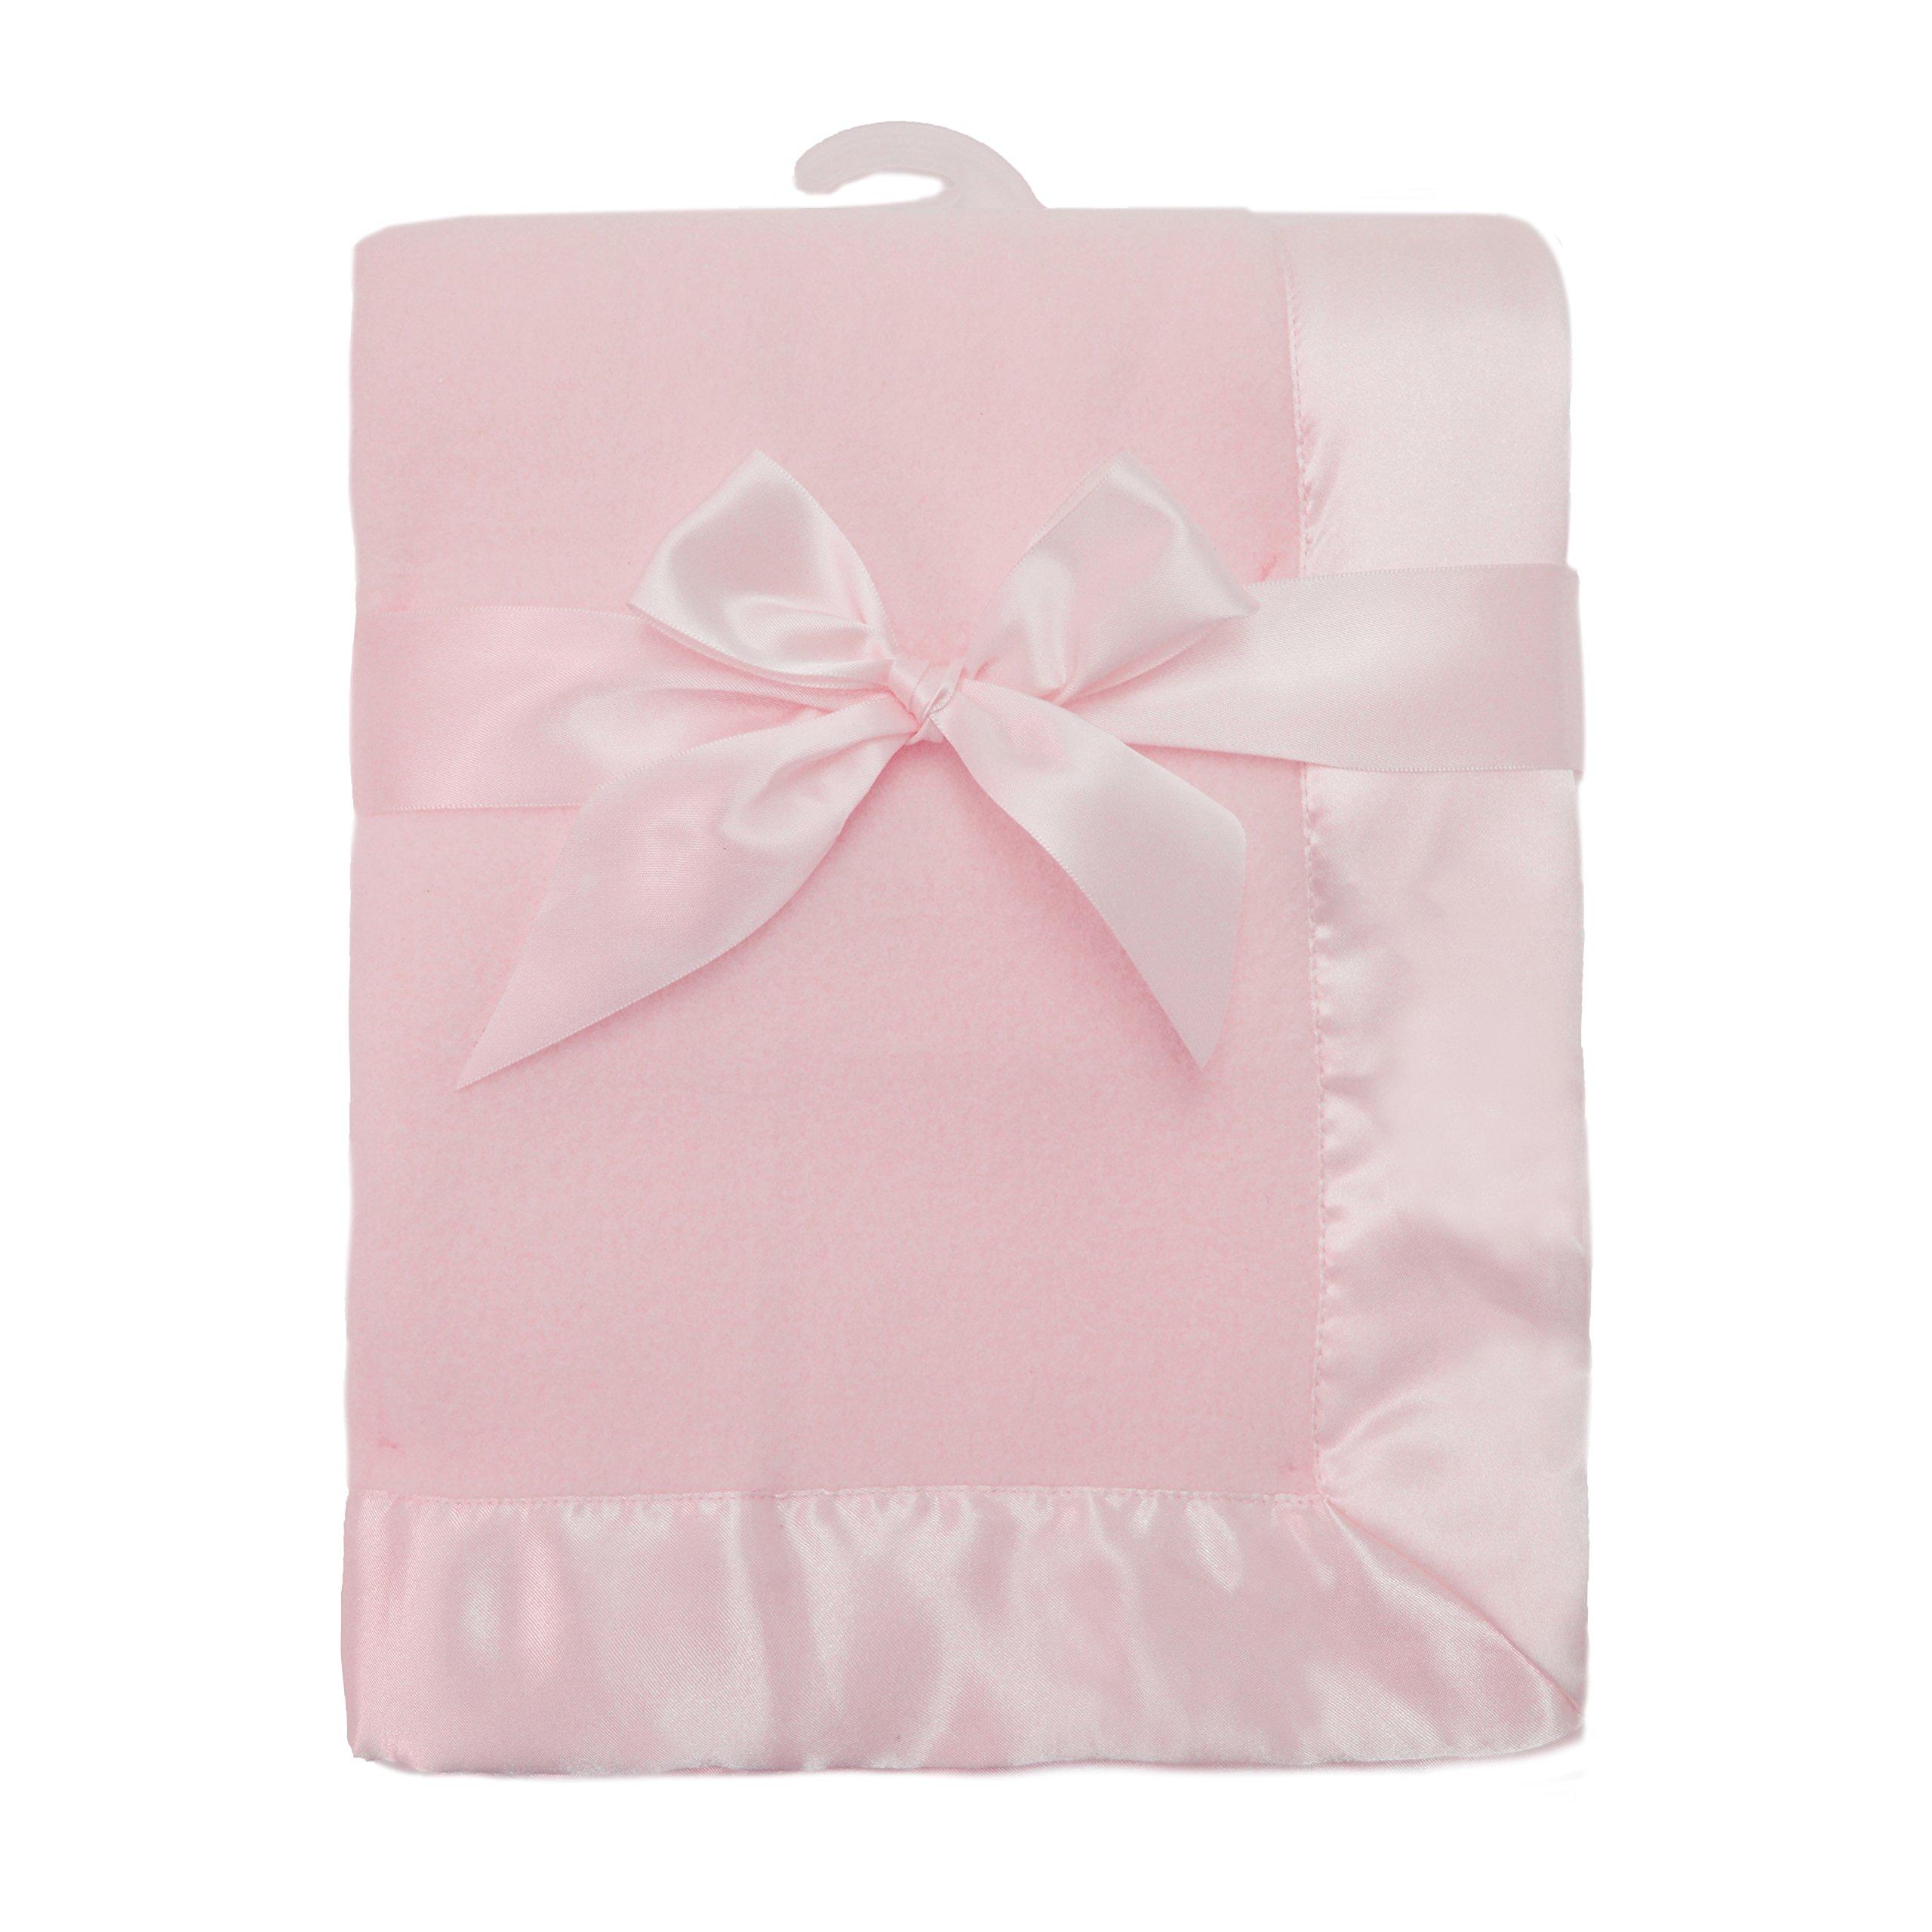 "American Baby Company Fleece Blanket 30"" X 40"" with 2"" Satin Trim, Pink"